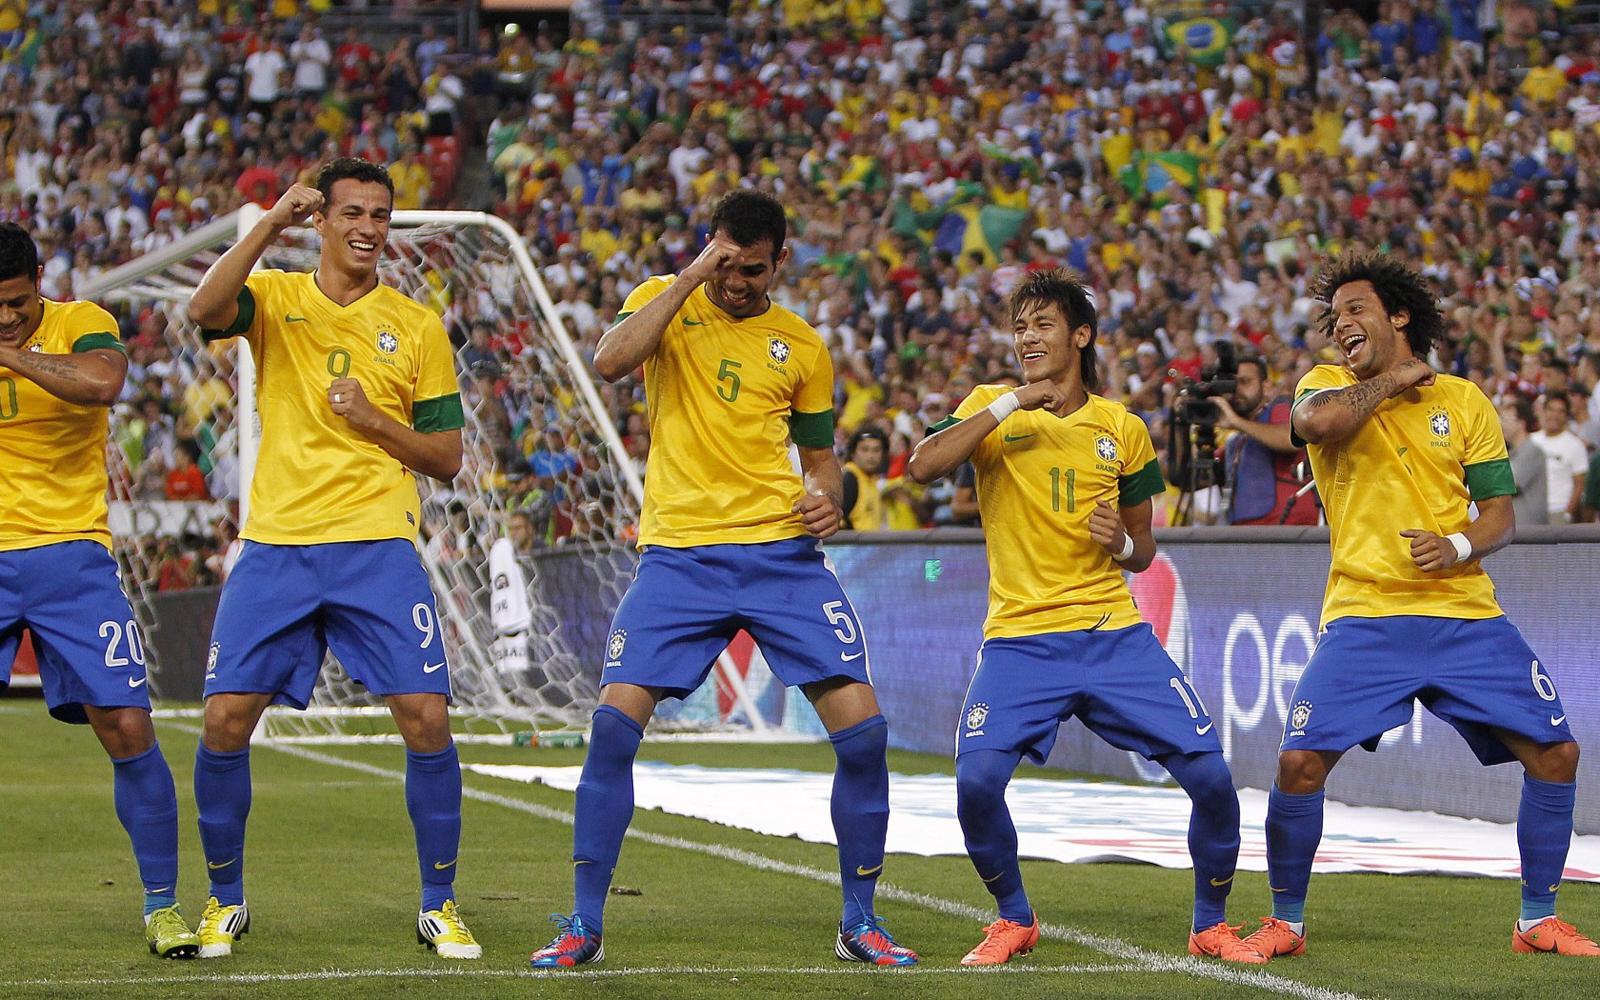 Brazil National Team 2013 Gangnam Style 1600x1000